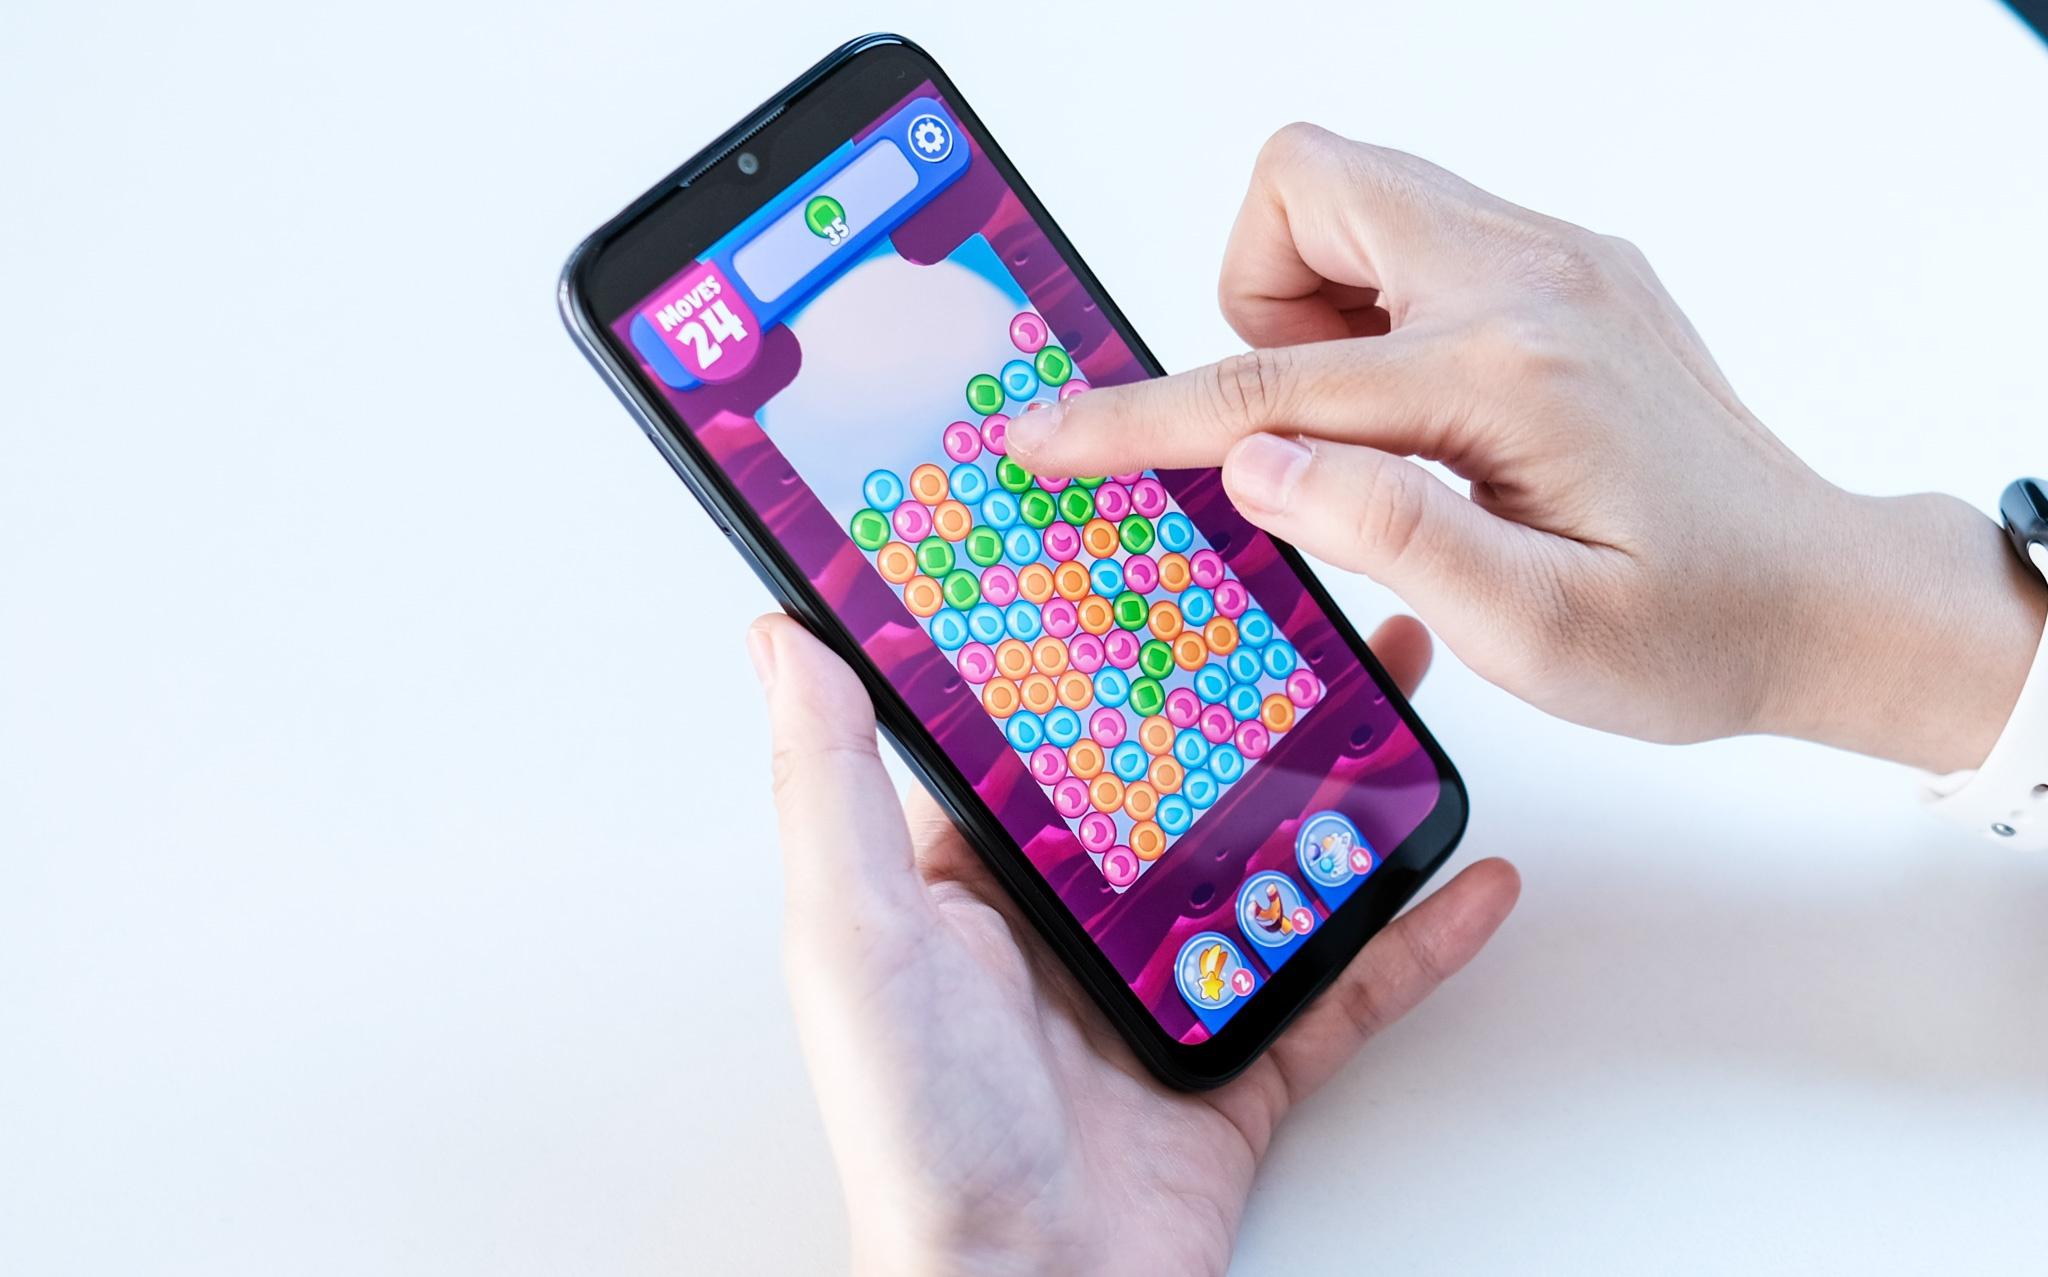 Loat smartphone duoi 3 trieu so huu man hinh lon, pin khoe hinh anh 1 joy.jpg